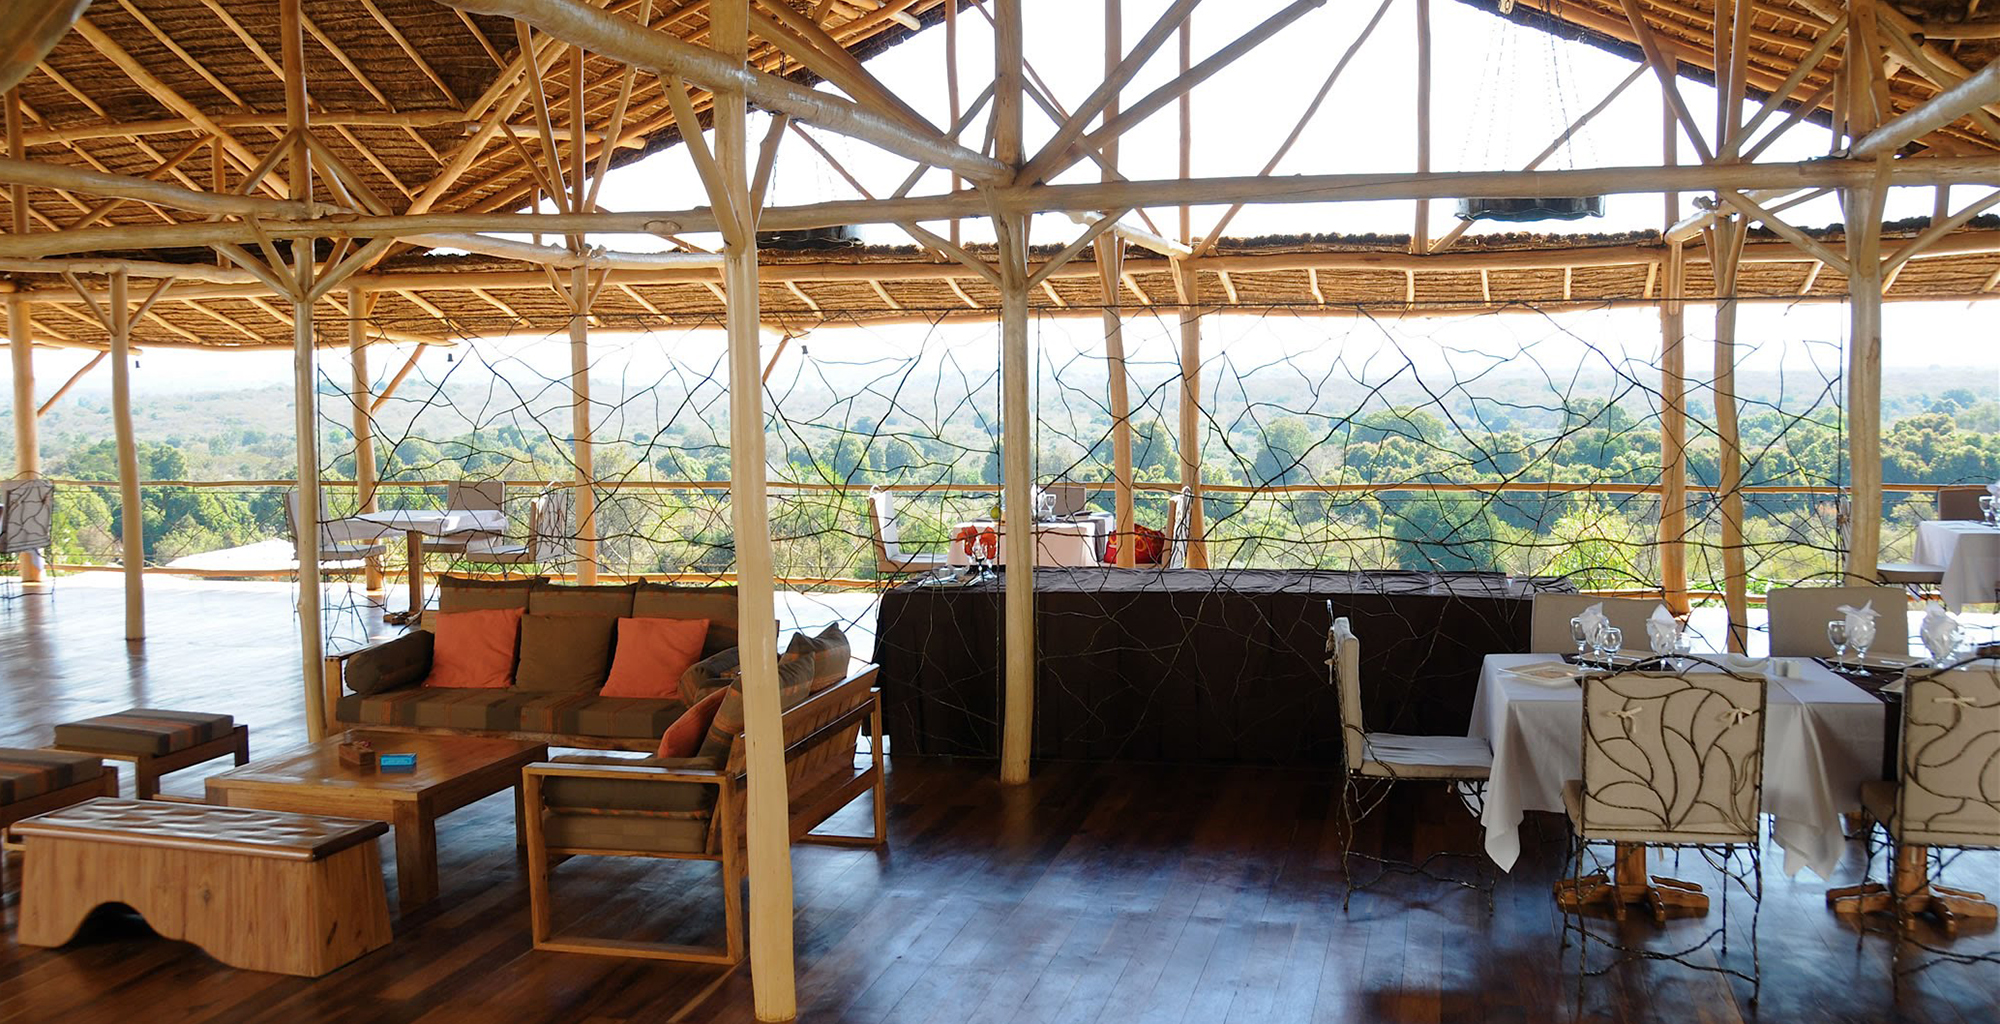 Madagascar-Soleil-des-Tsingy-Lounge-Dining